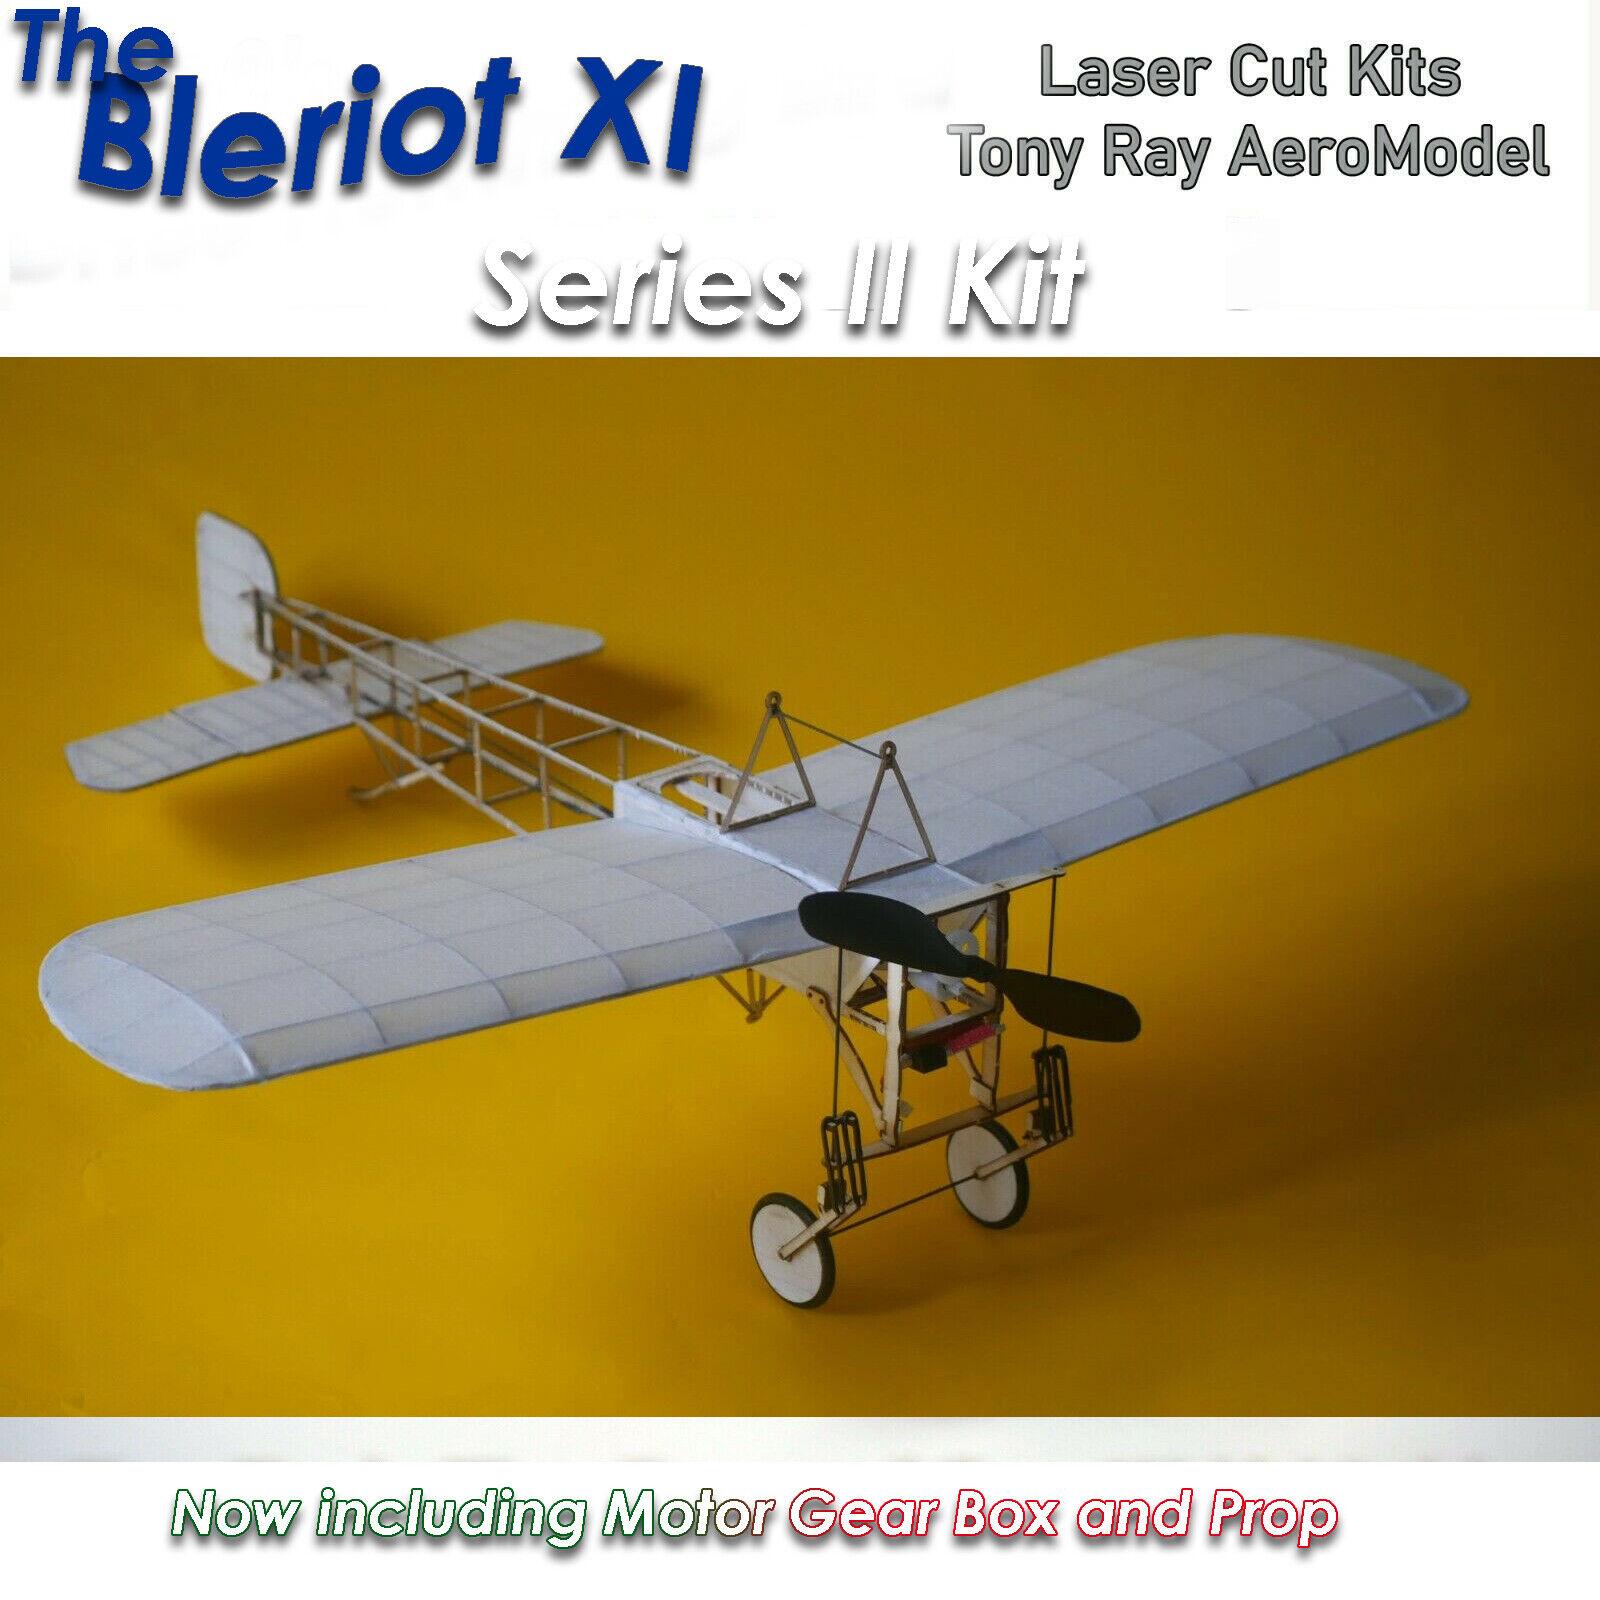 Tony Ray's Laser Cut Balsa Bleriot XI Radio Control Kit w/ Motor,Gearbox,Prop DL